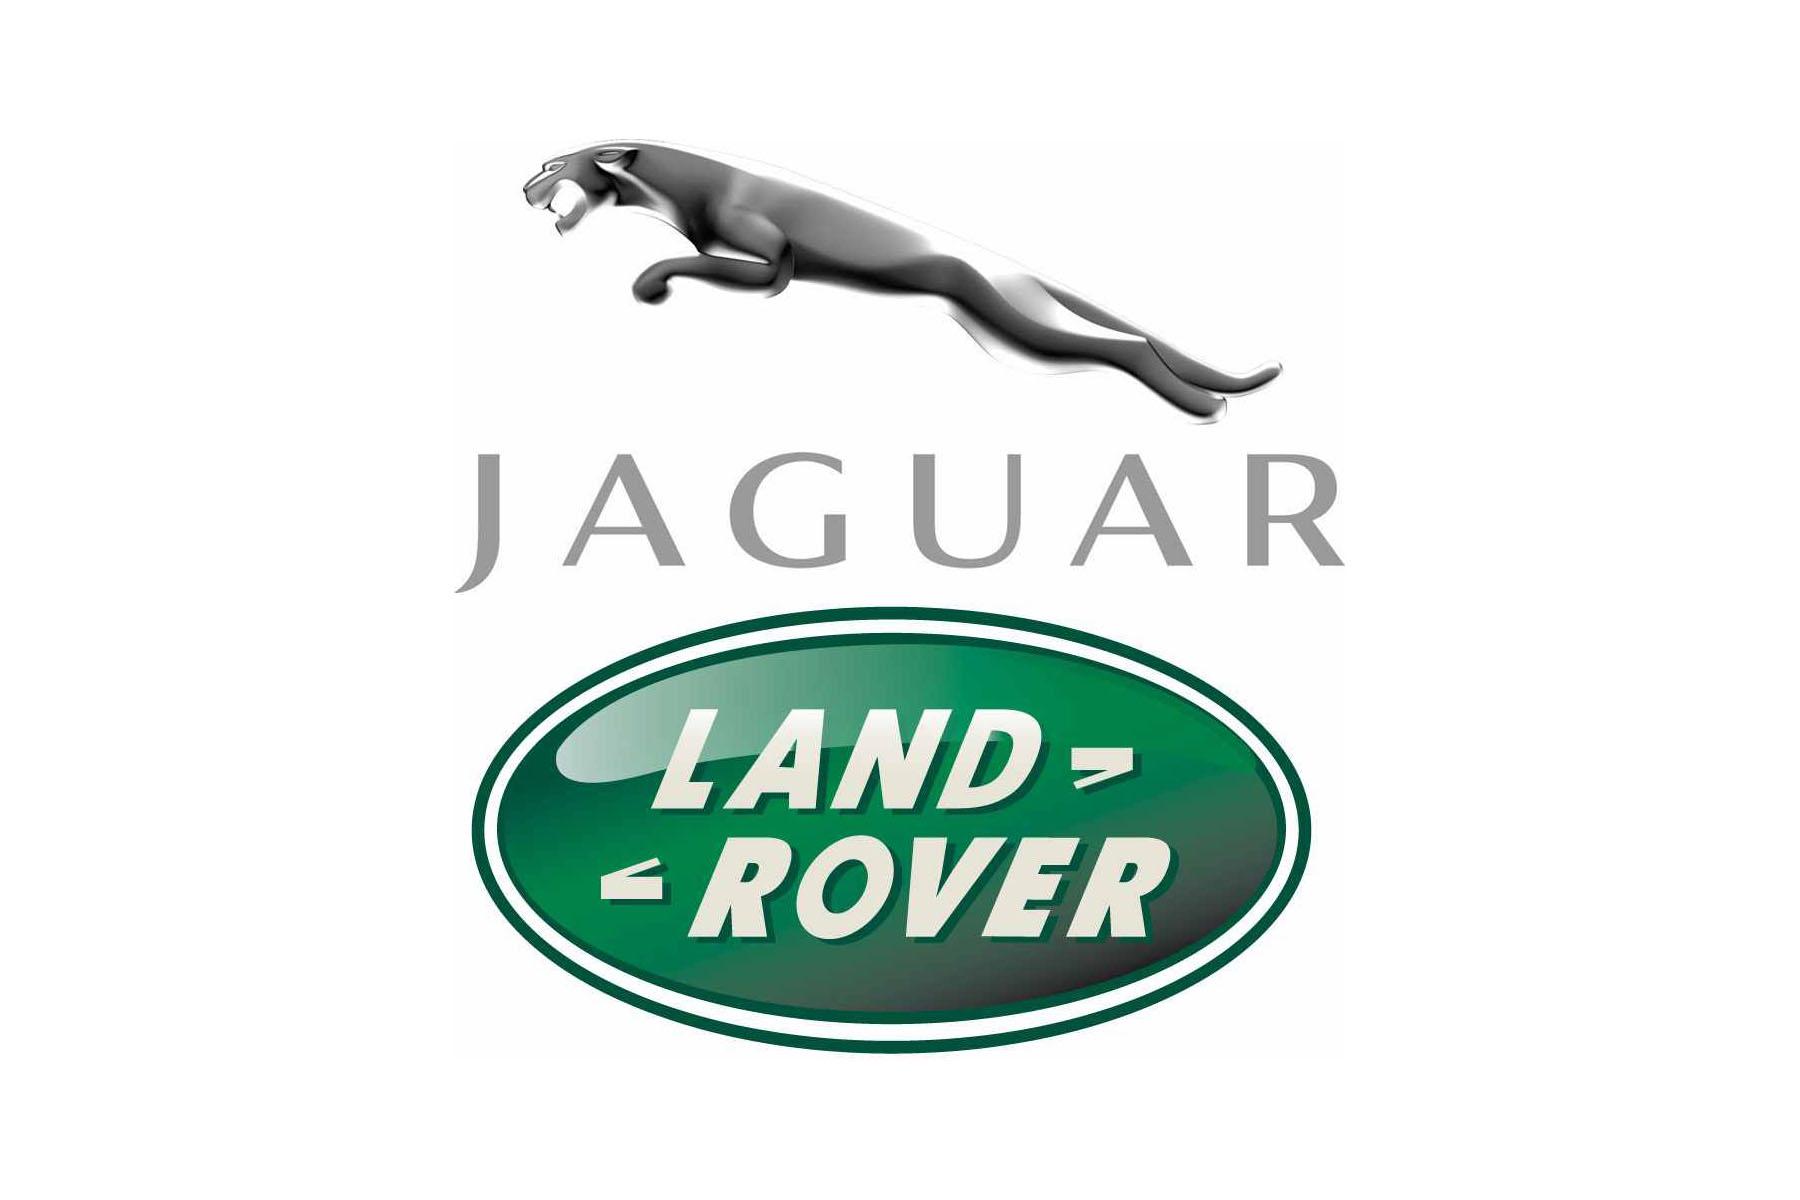 jaguar-lr-logo.jpg